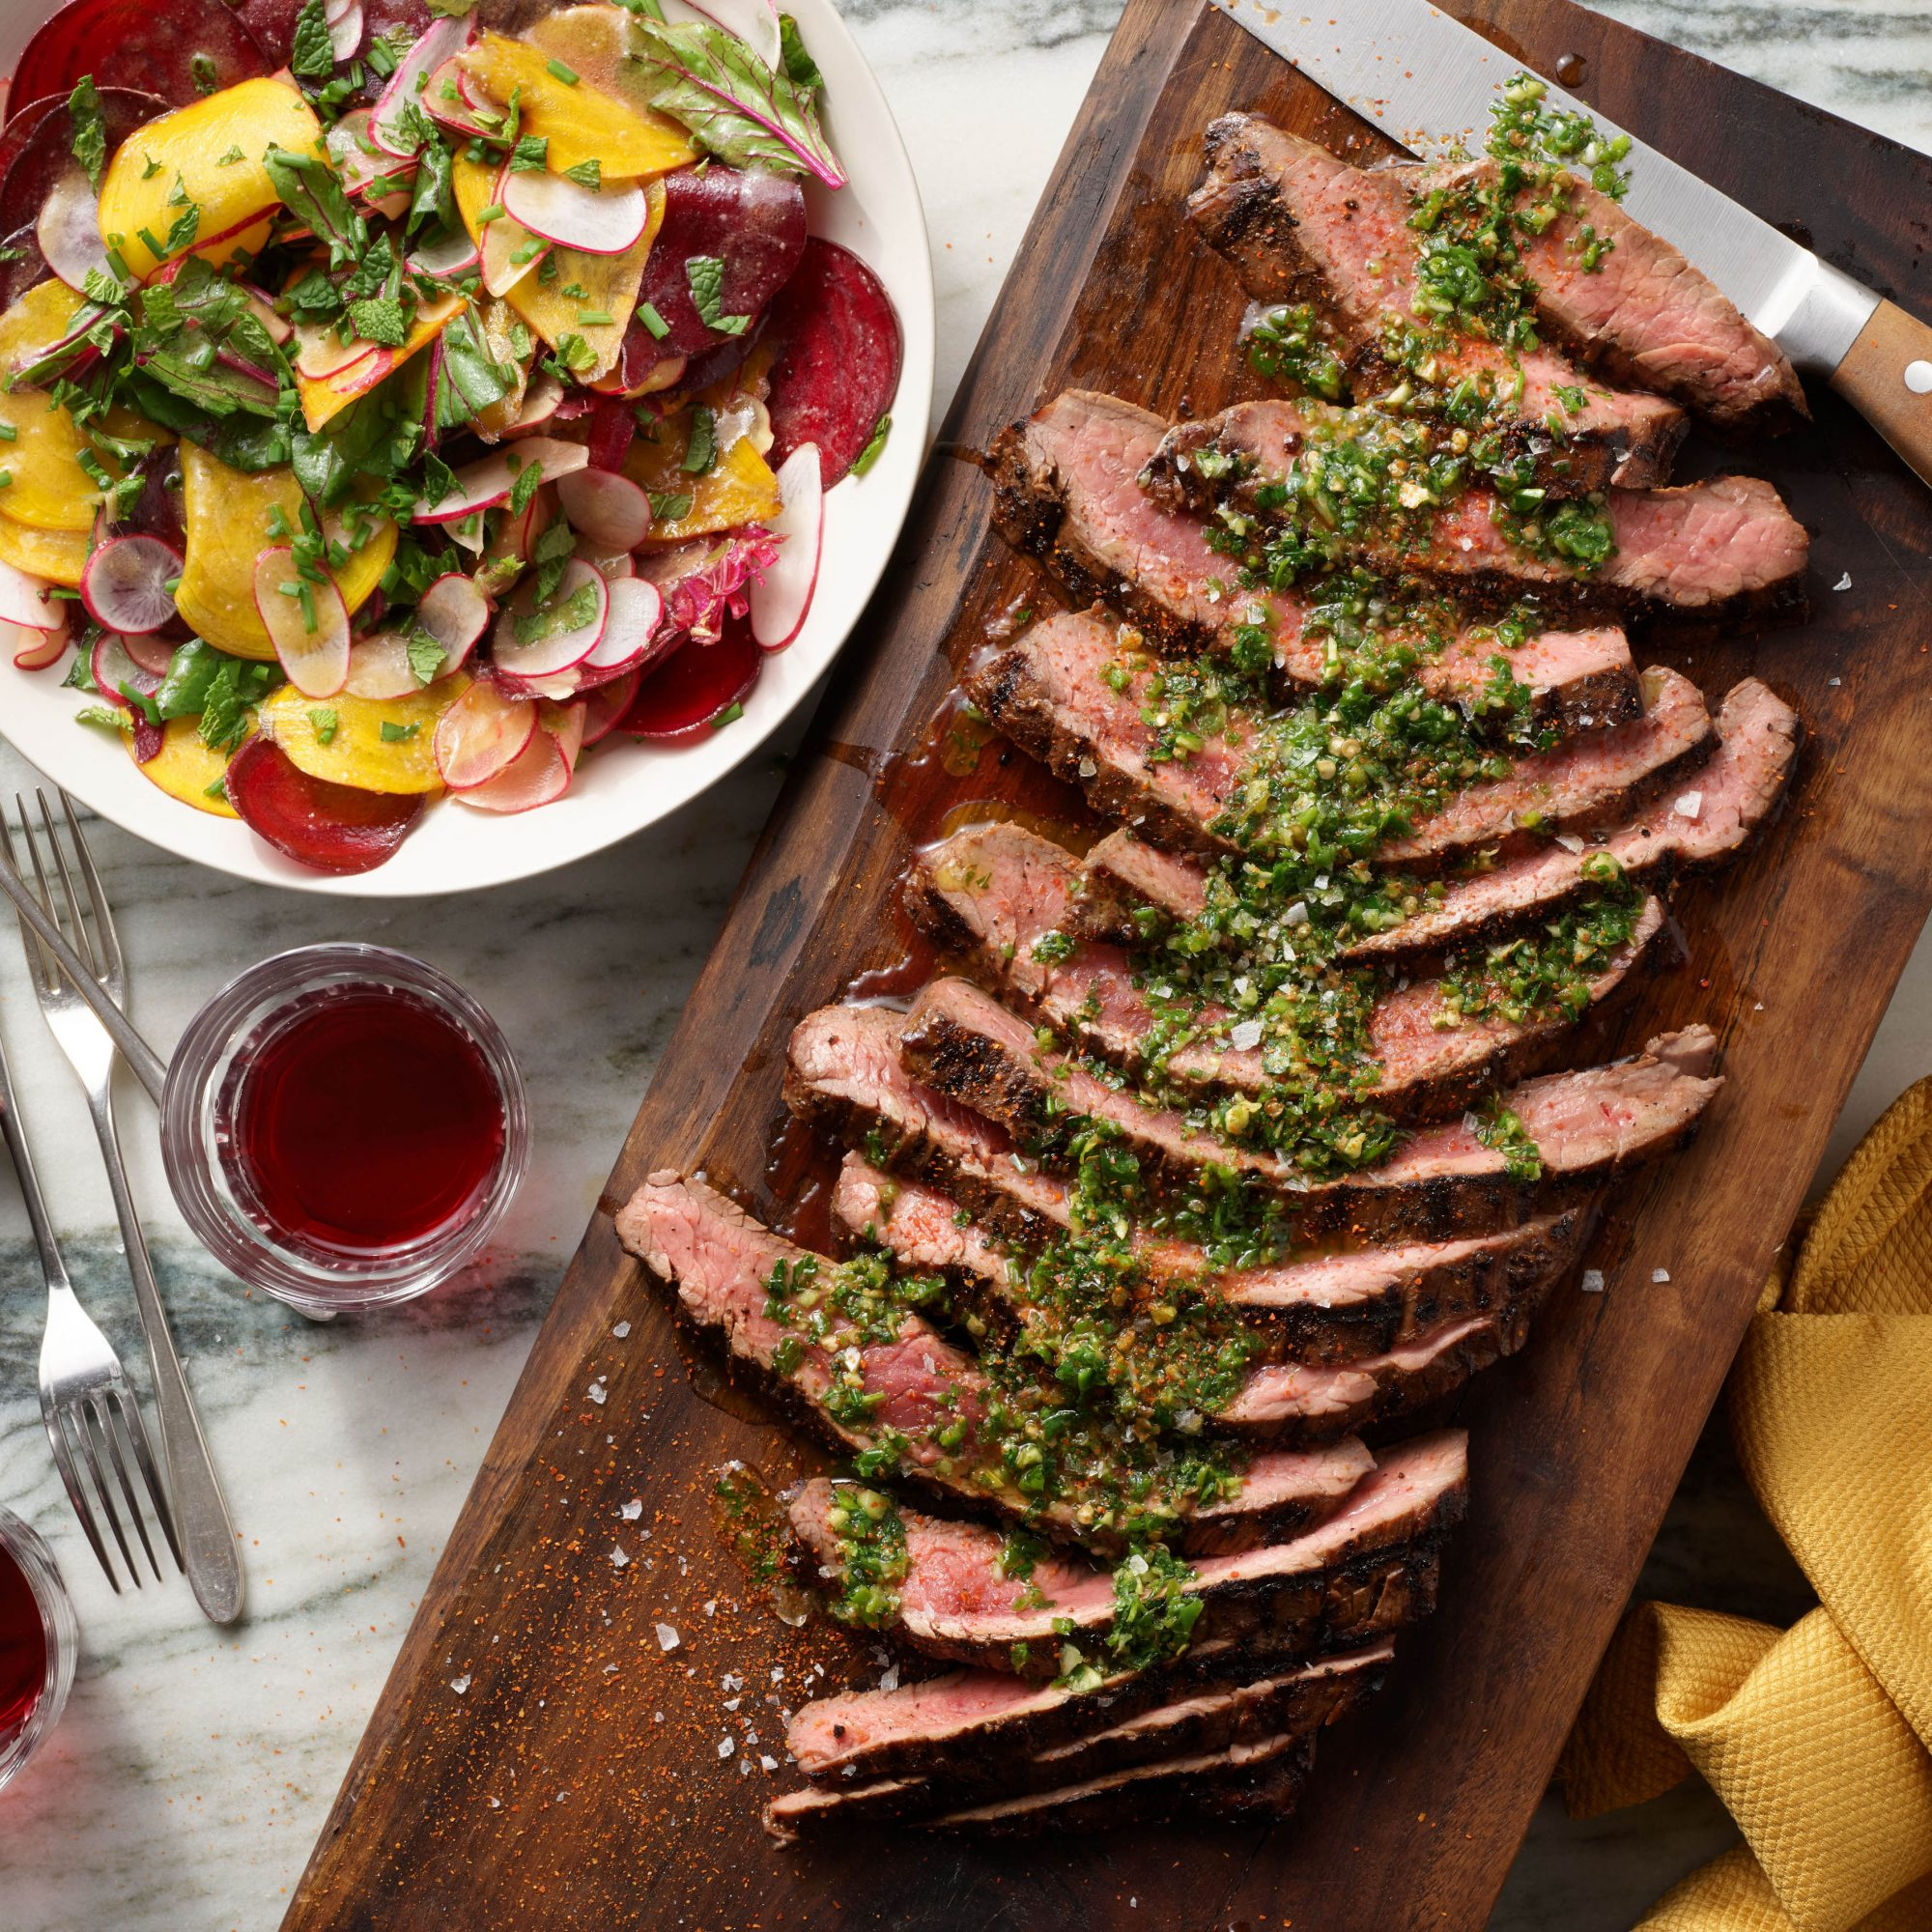 Rachael Ray's Flank Steak with Shishito-Shiso Salsa Verde & Beet Carpaccio